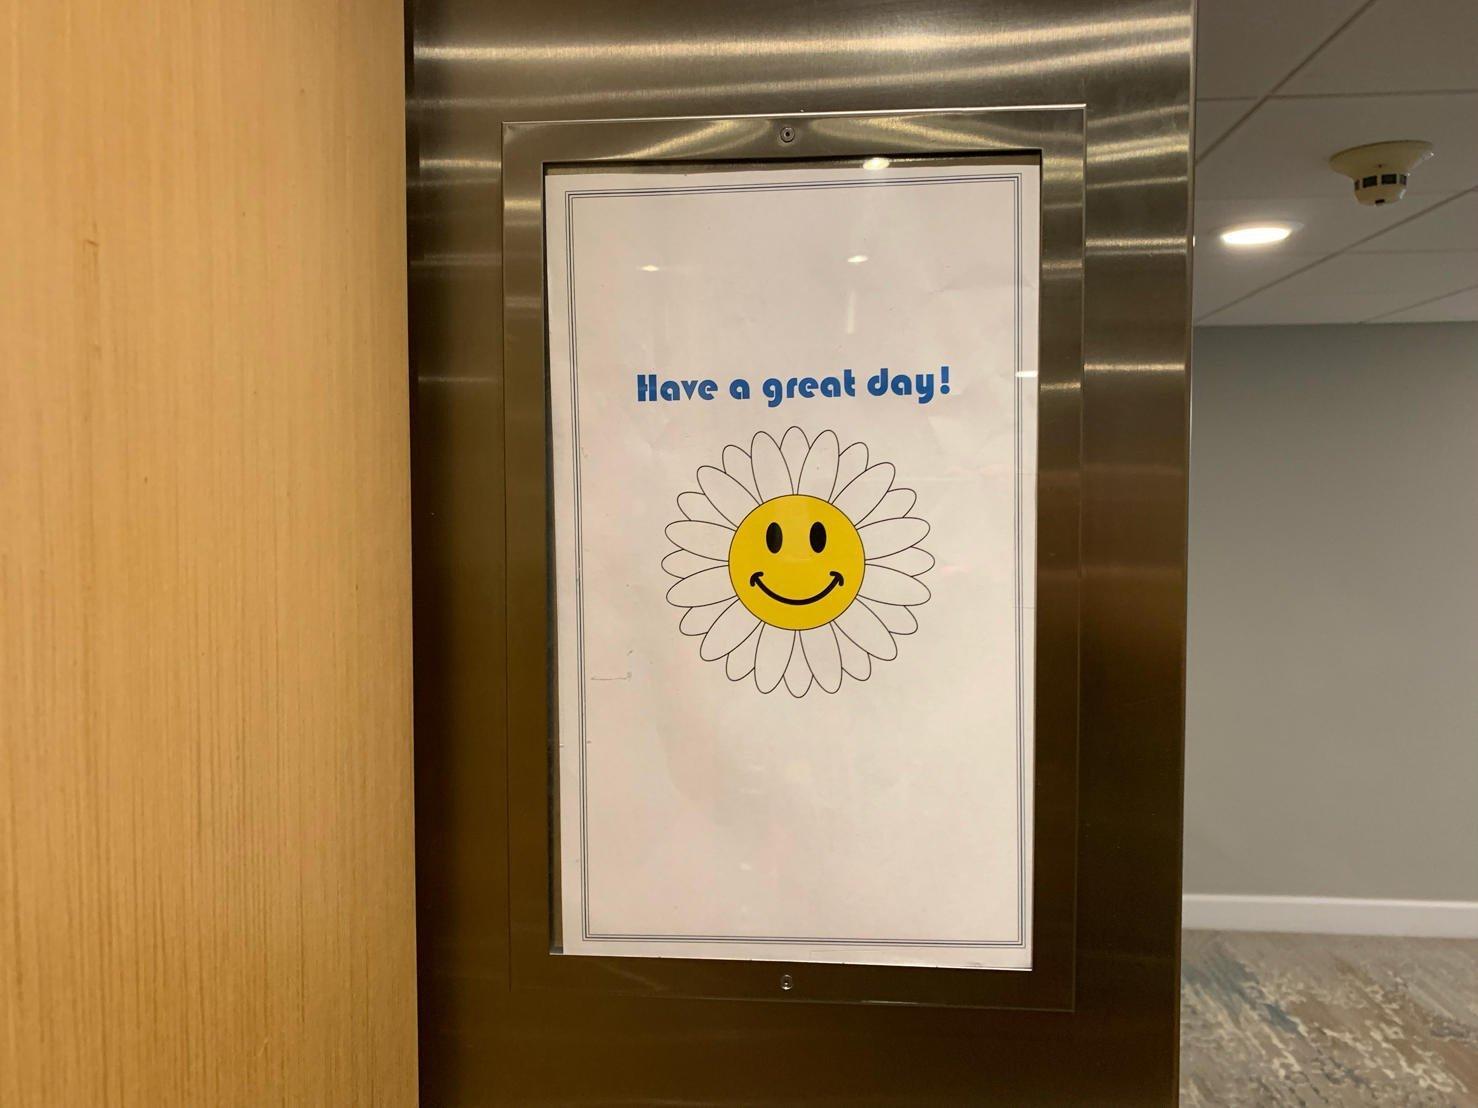 """HAVE A GREAT DAY"" - Ignacio Isusi"